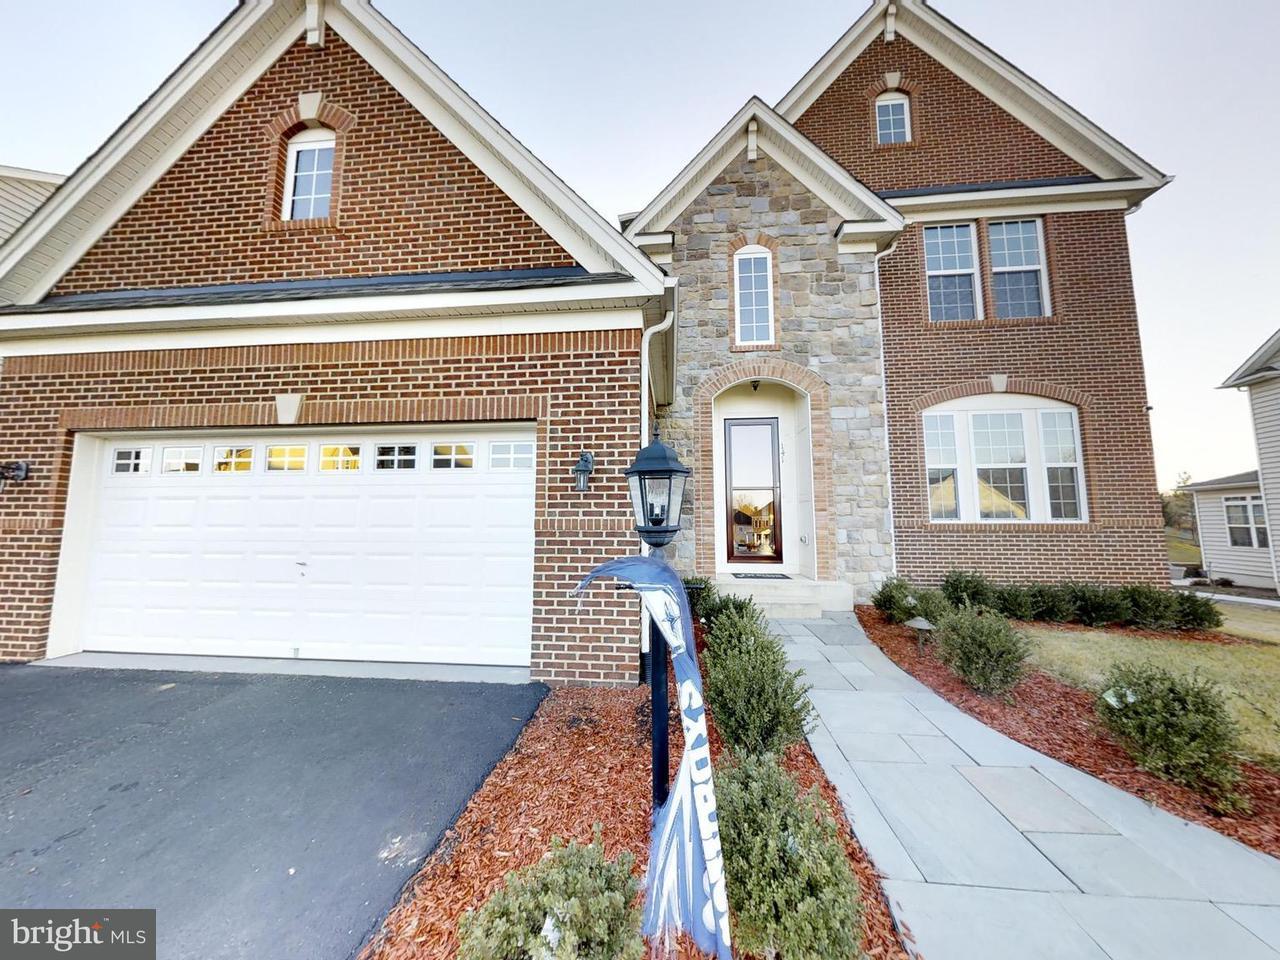 Casa Unifamiliar por un Venta en 141 Coachman Circle 141 Coachman Circle Stafford, Virginia 22554 Estados Unidos